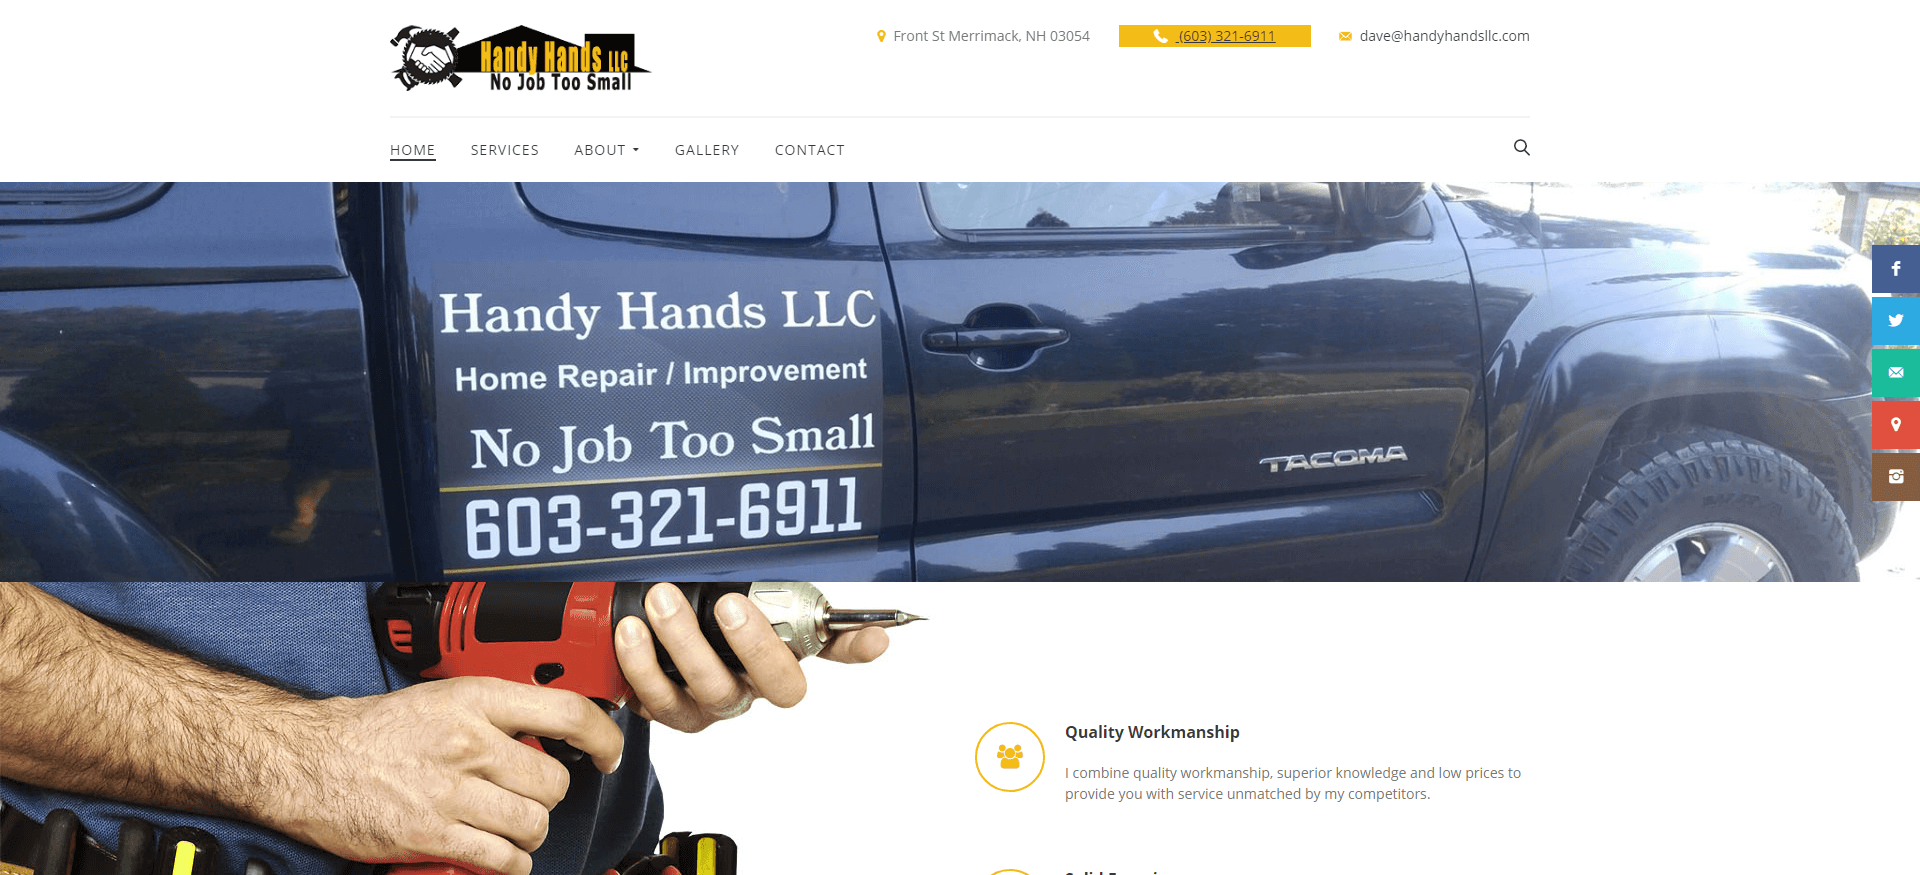 Handy Hands LLC